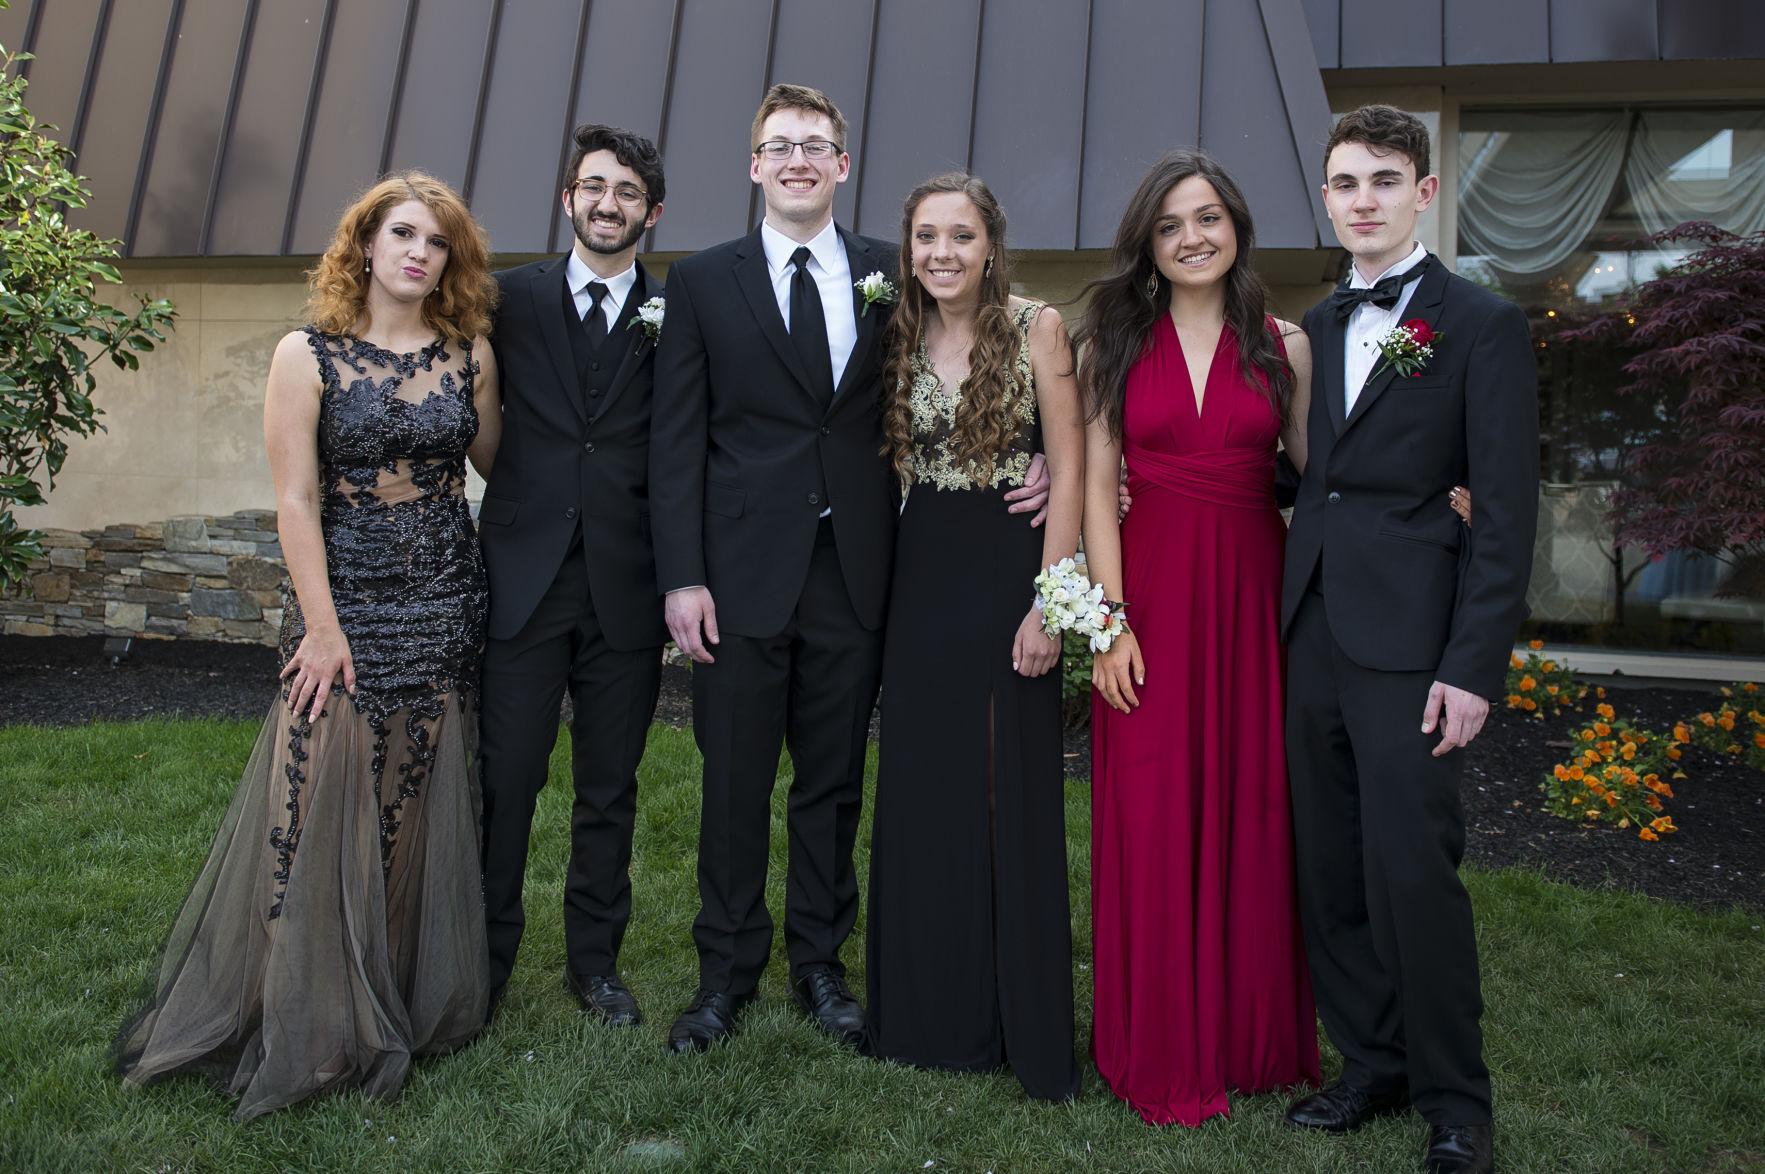 Hempfield High School prom 2017